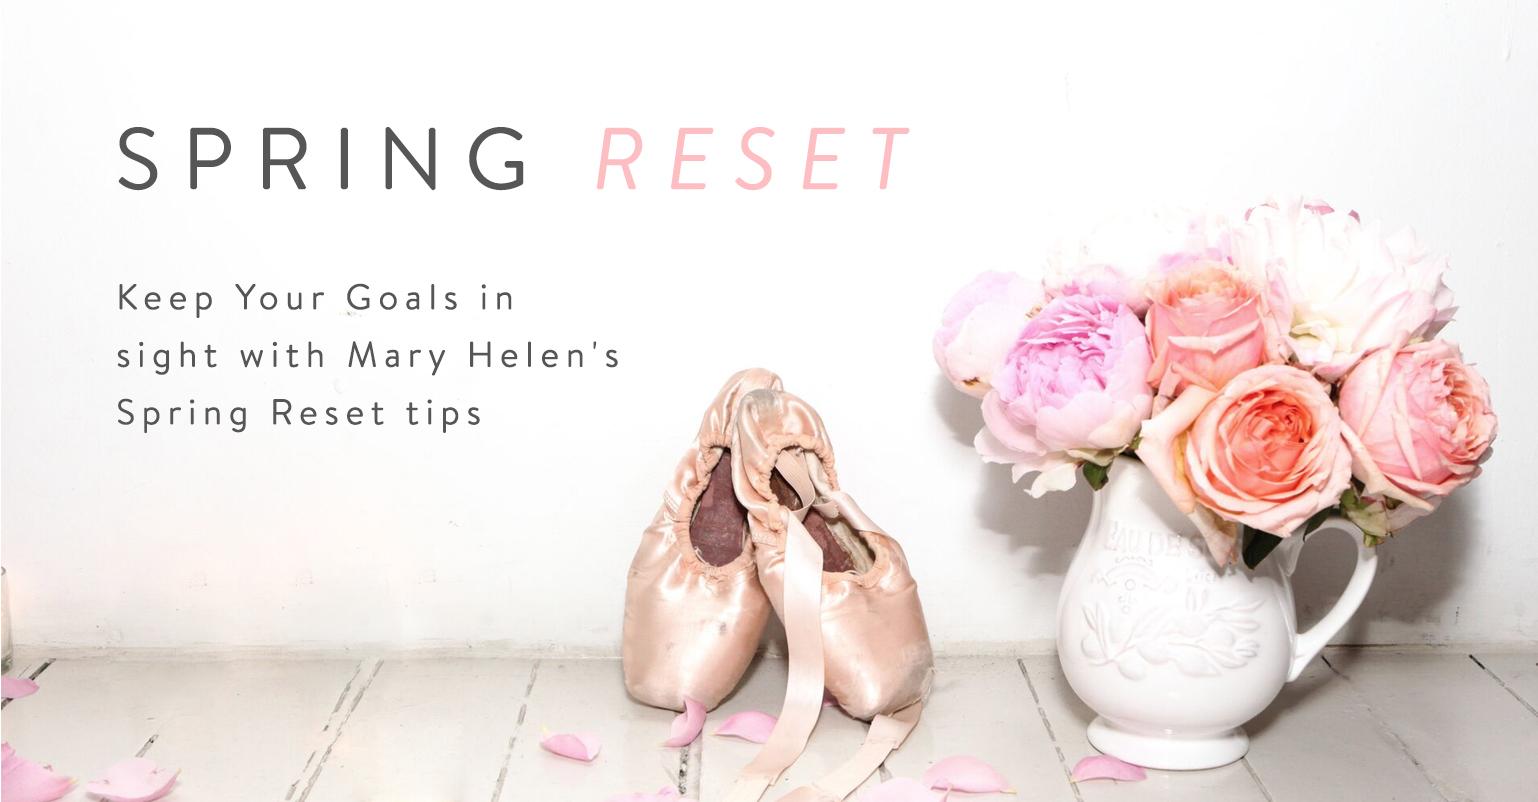 Mary Helen's Spring Reset